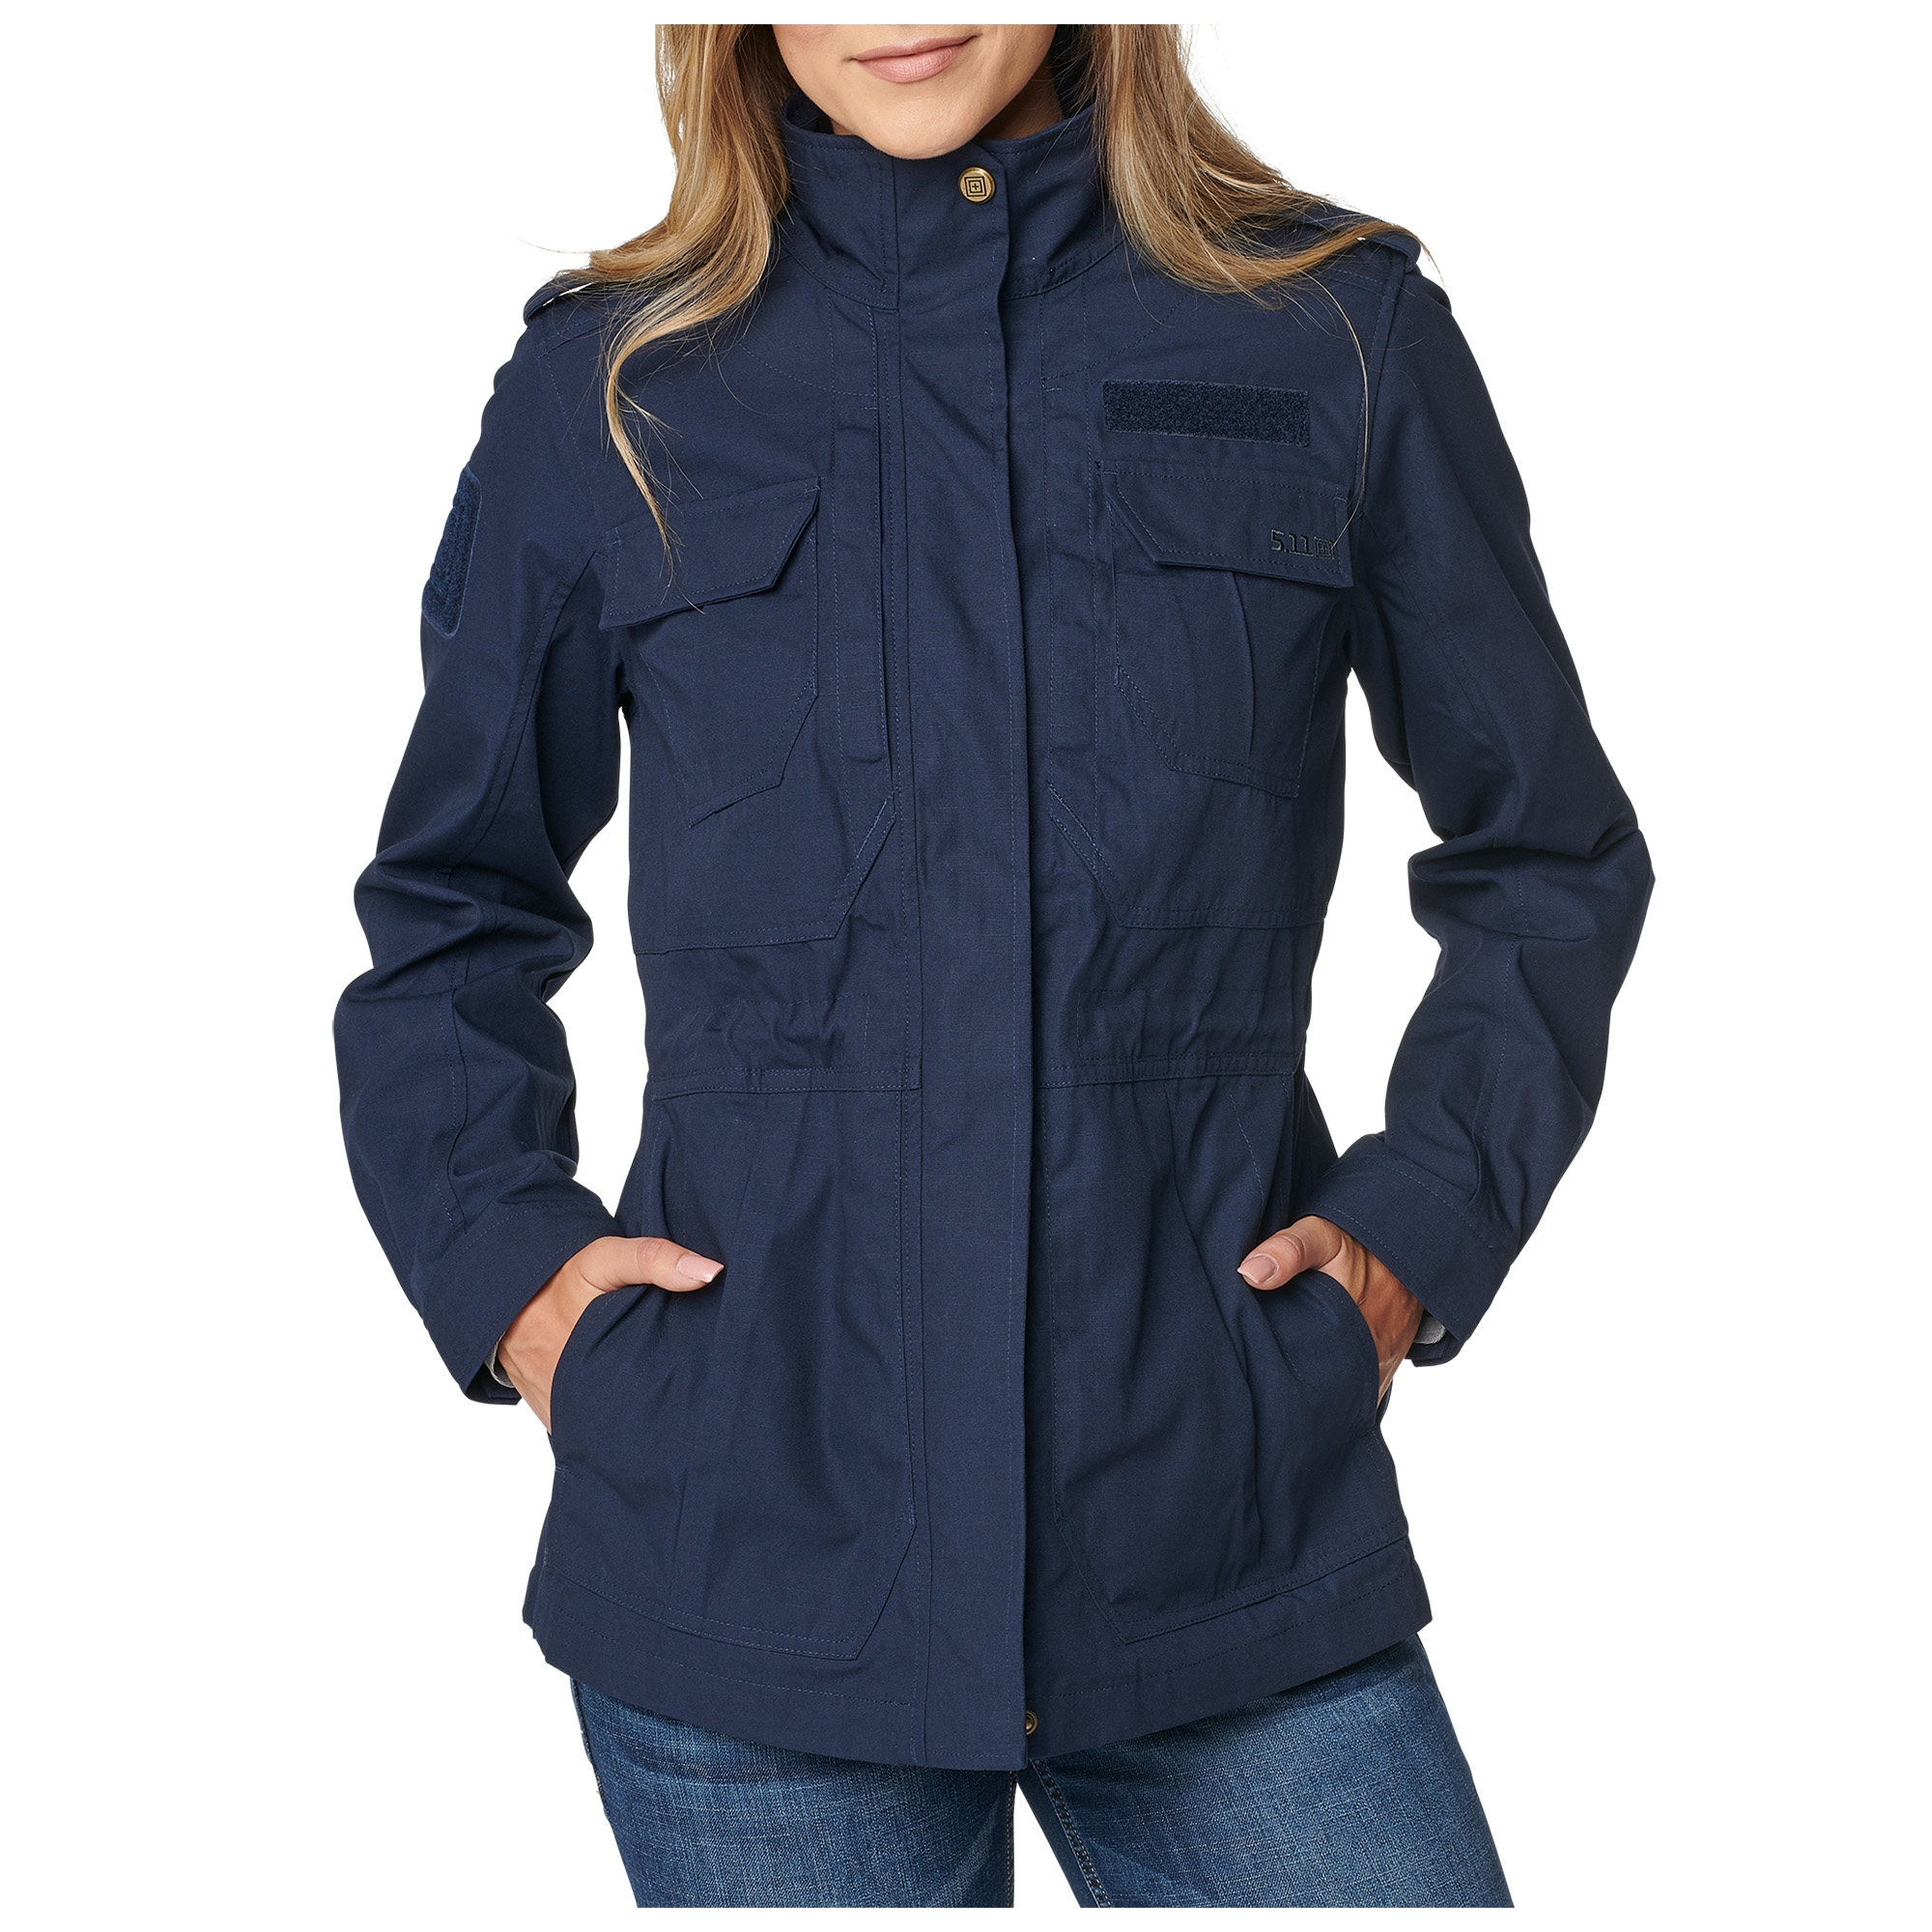 5.11 Tactical Women Womens Taclite M65 Jacket